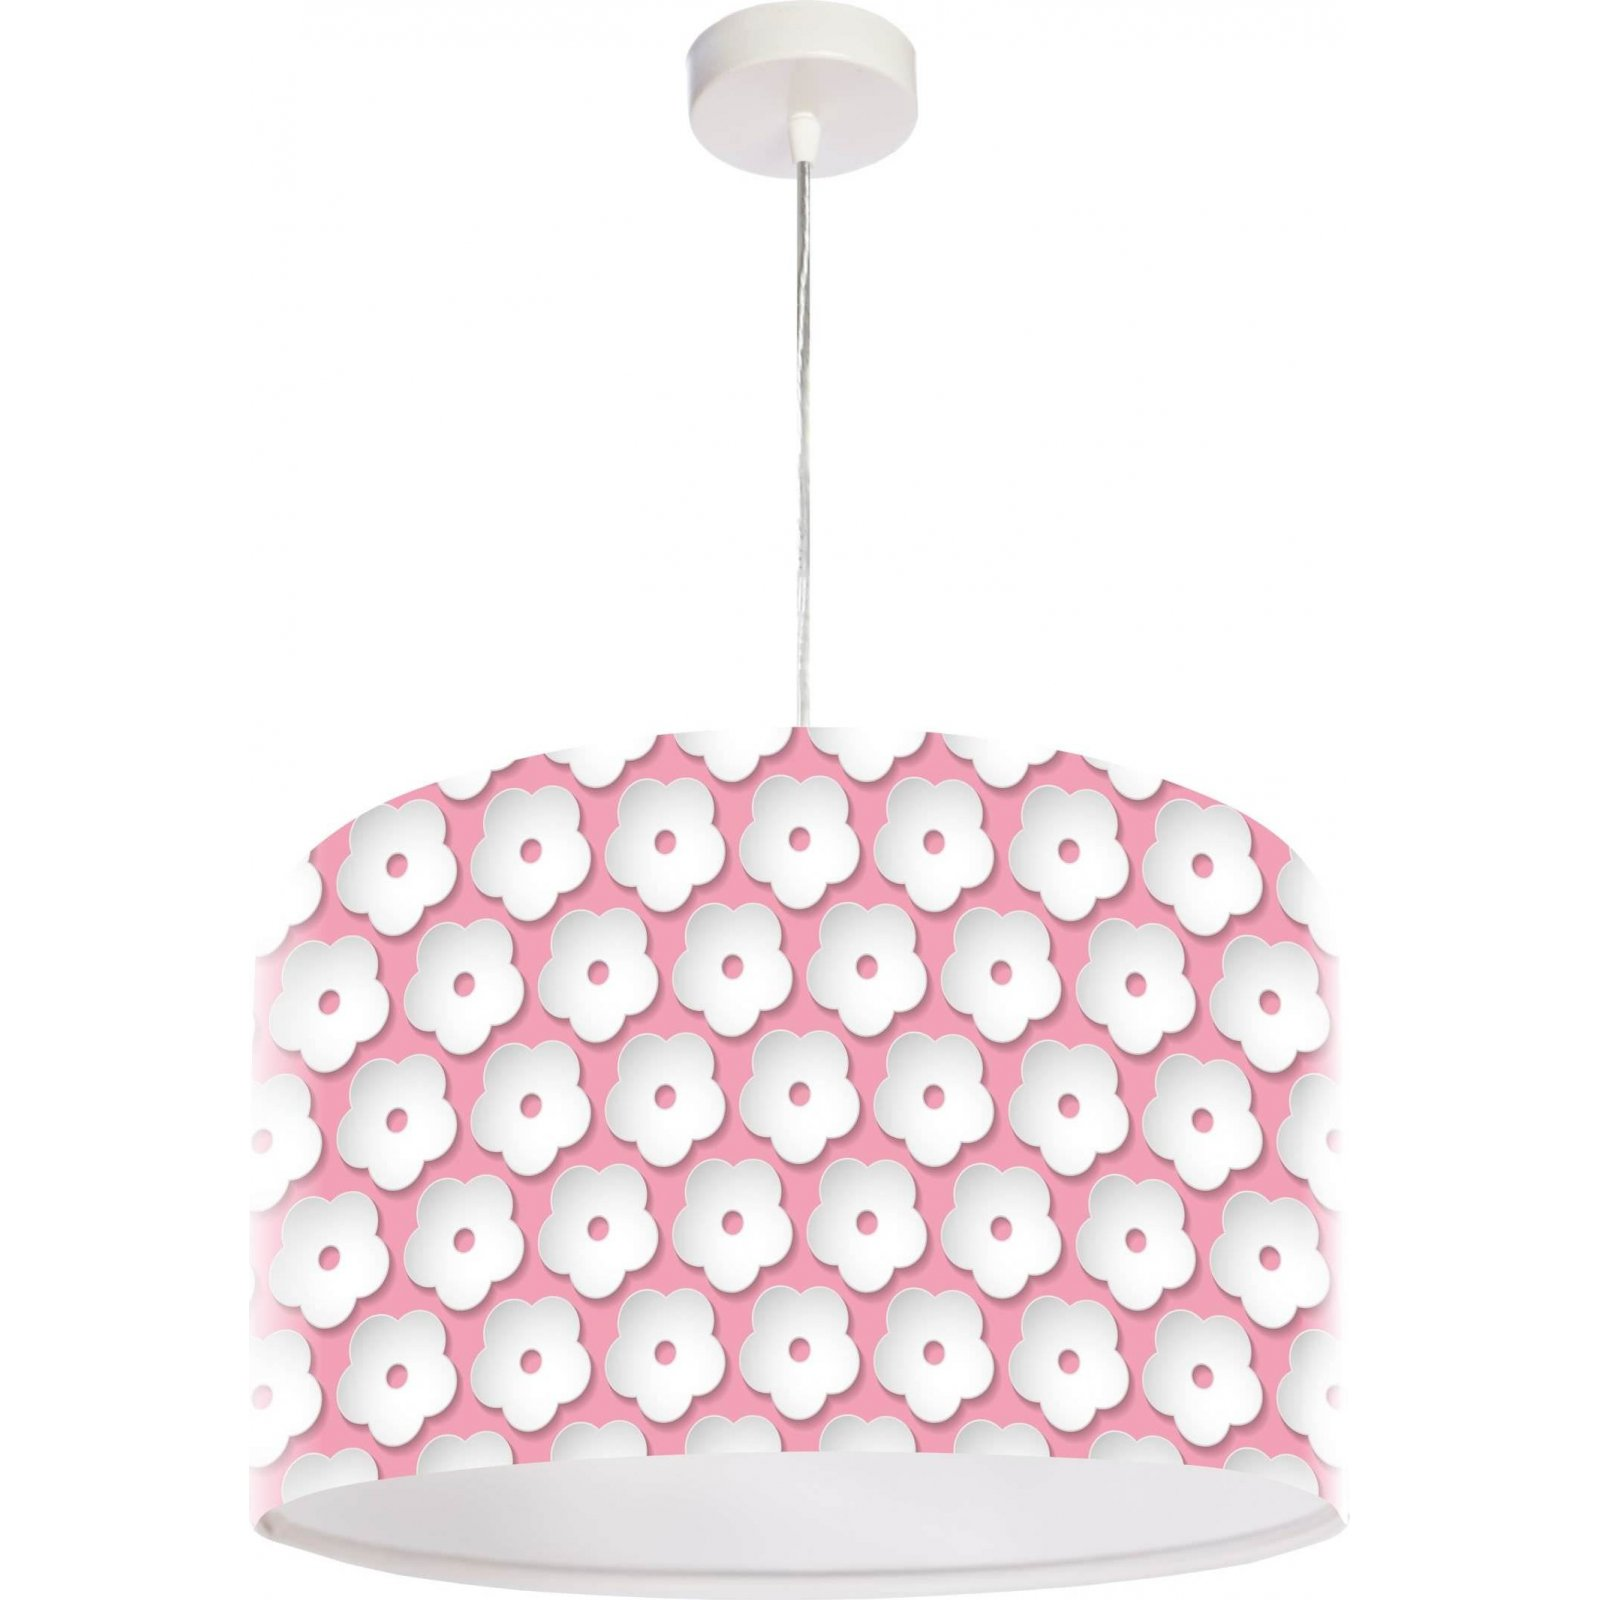 Suspension enfant abat-jour tissu rose et blanc Ø 40